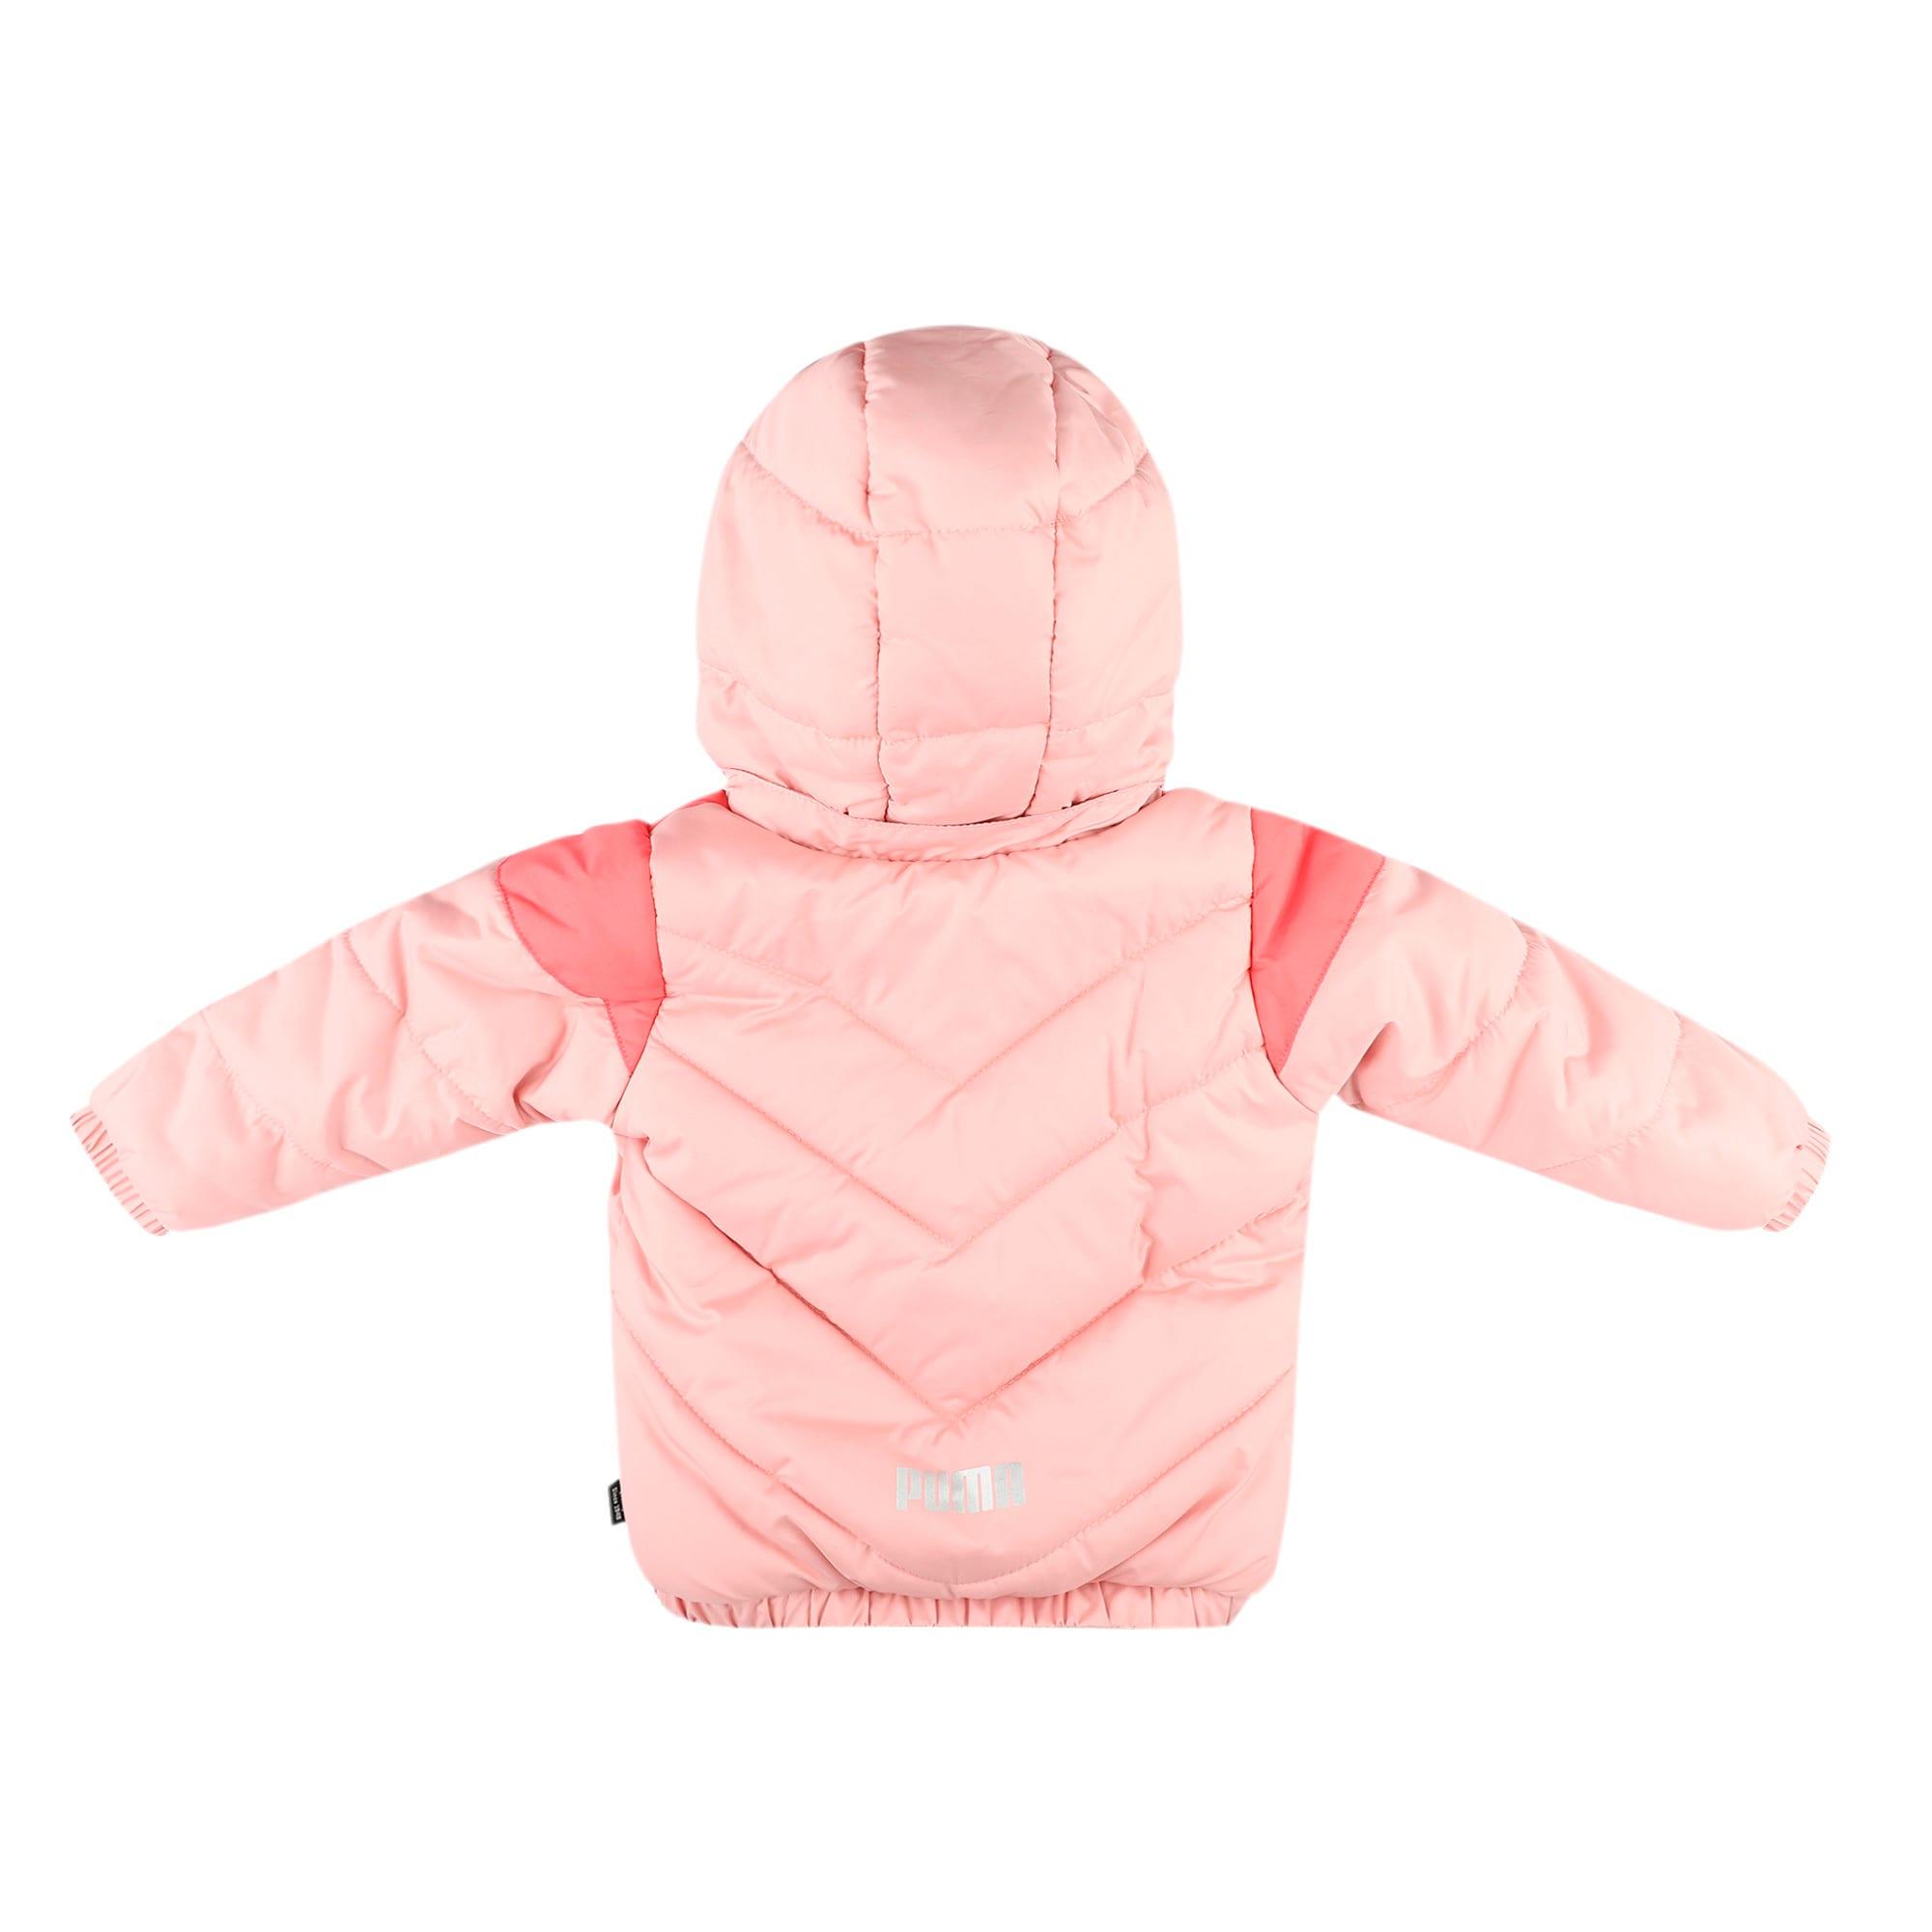 Thumbnail 2 of Minicats Padded Infant Jacket, Bridal Rose, medium-IND